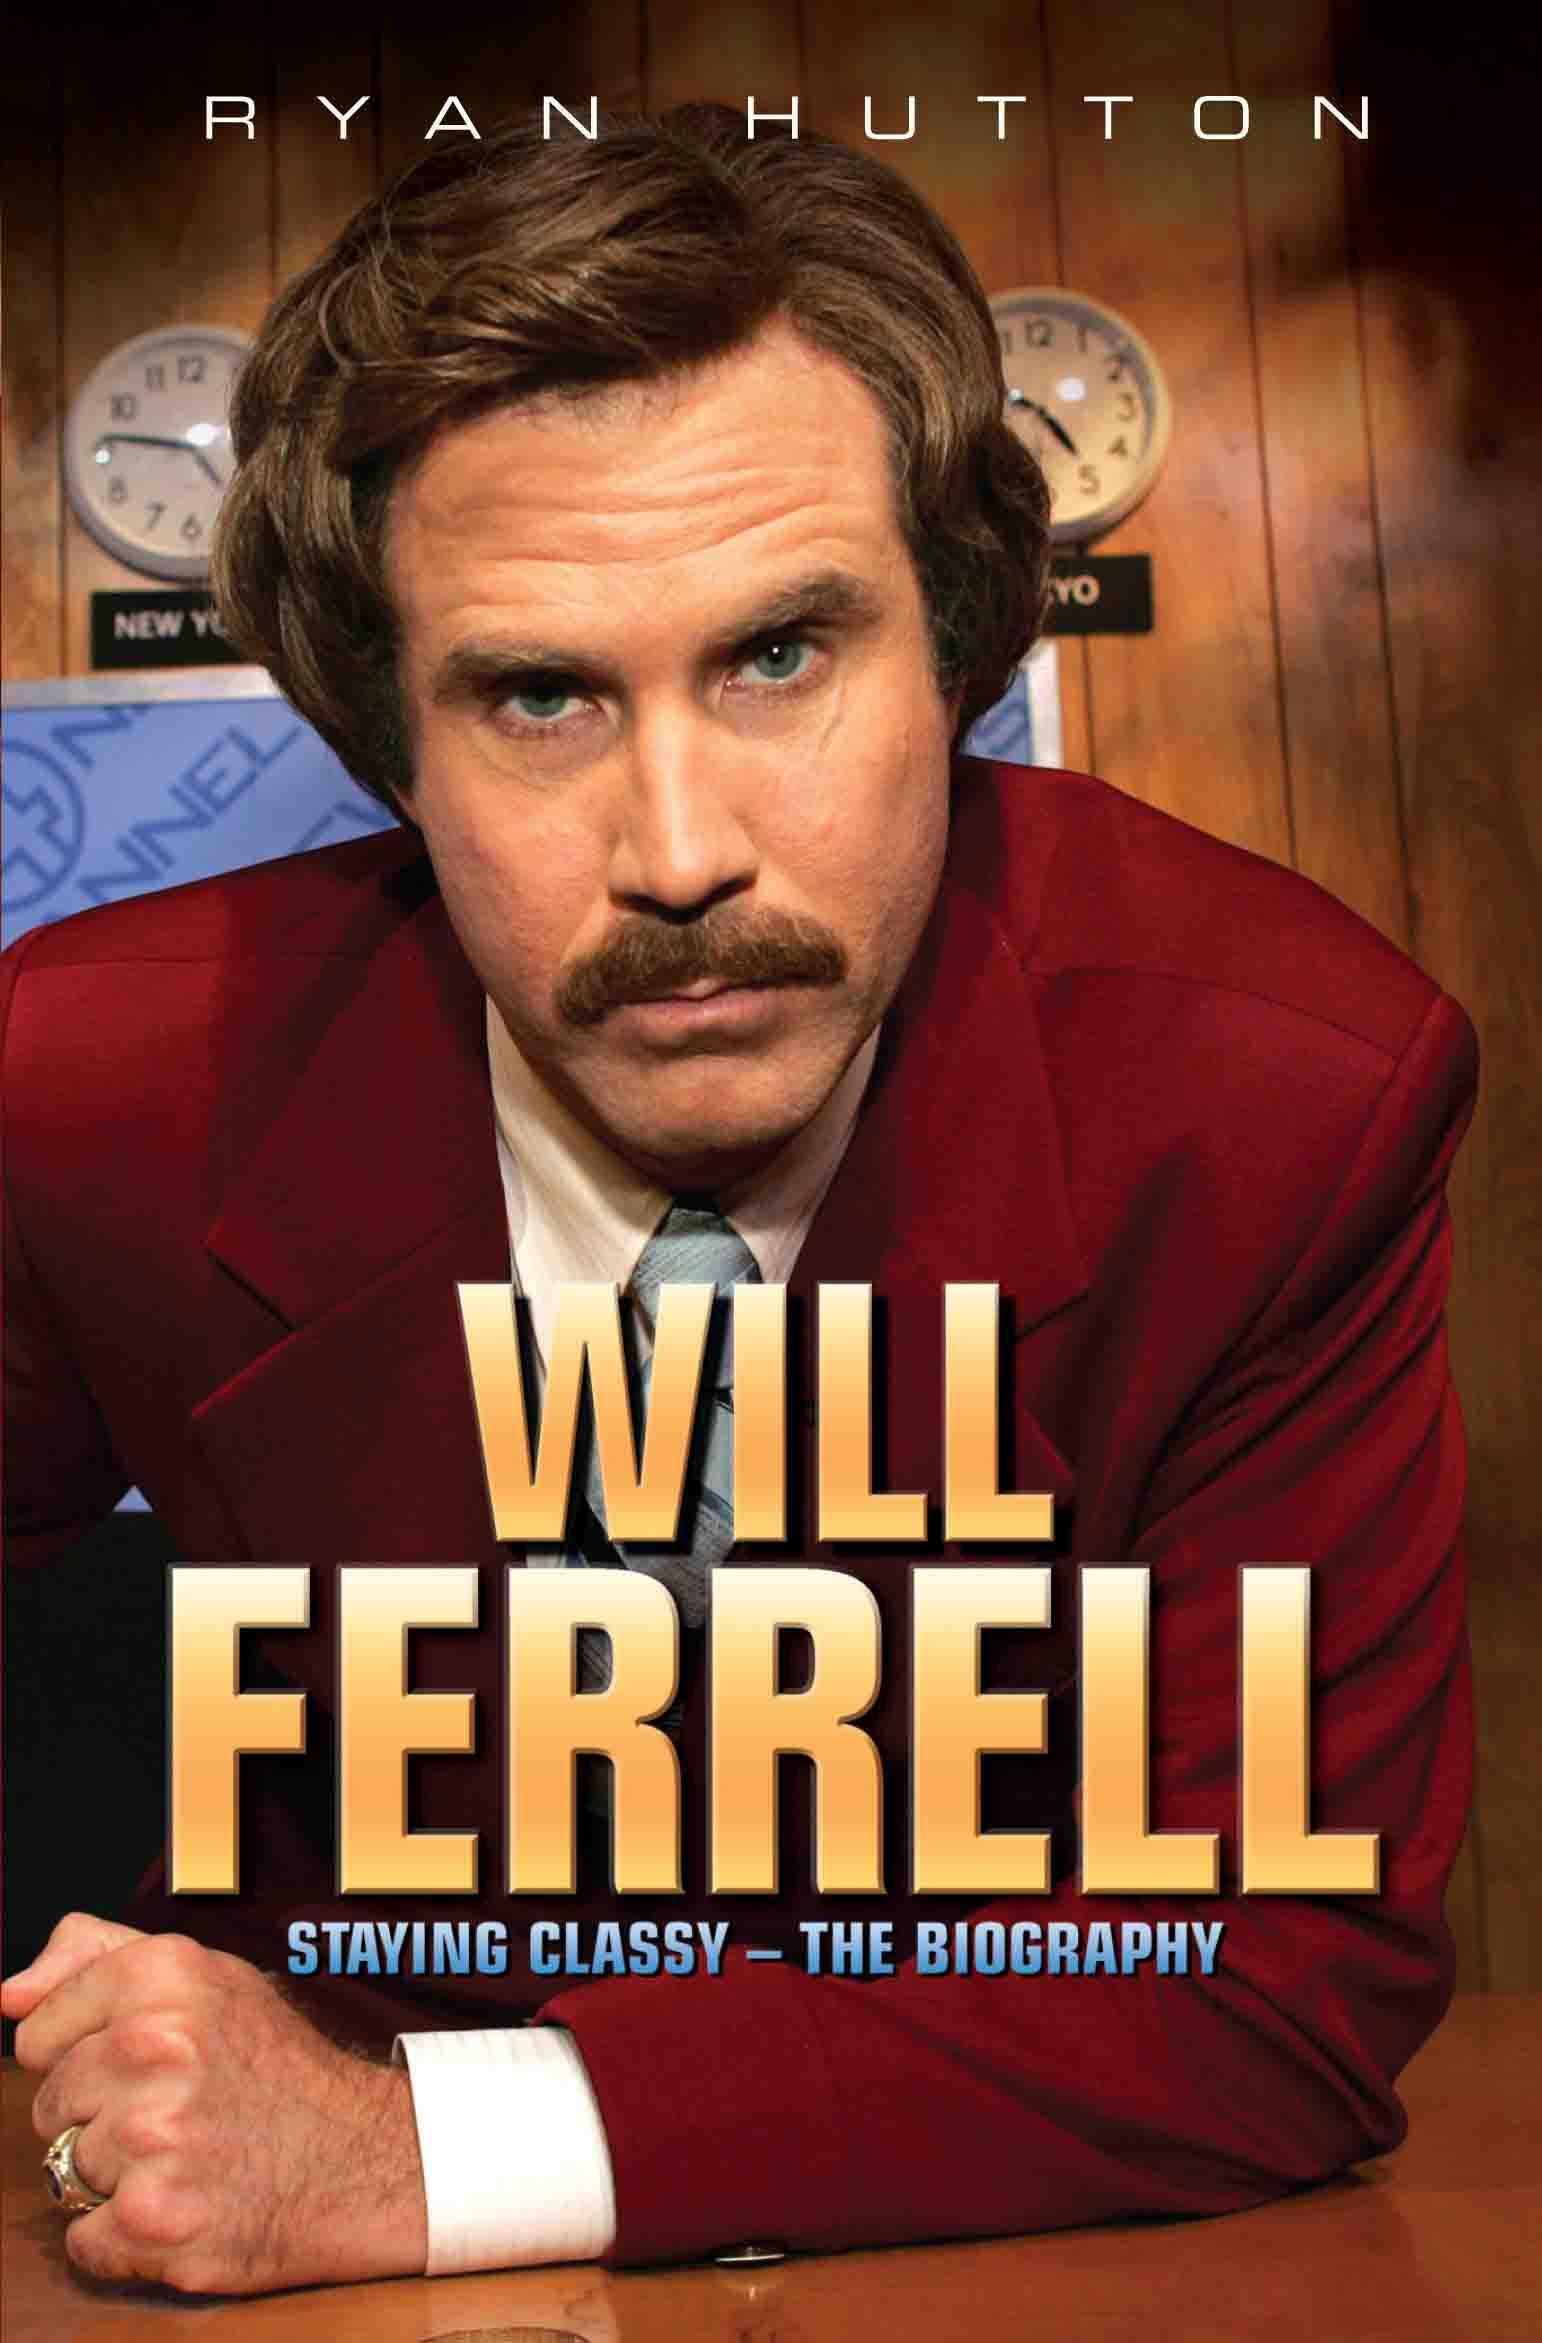 Will Ferrell: Staying Classy - The Biography: Ryan Hutton: 9781782197645:  Amazon.com: Books